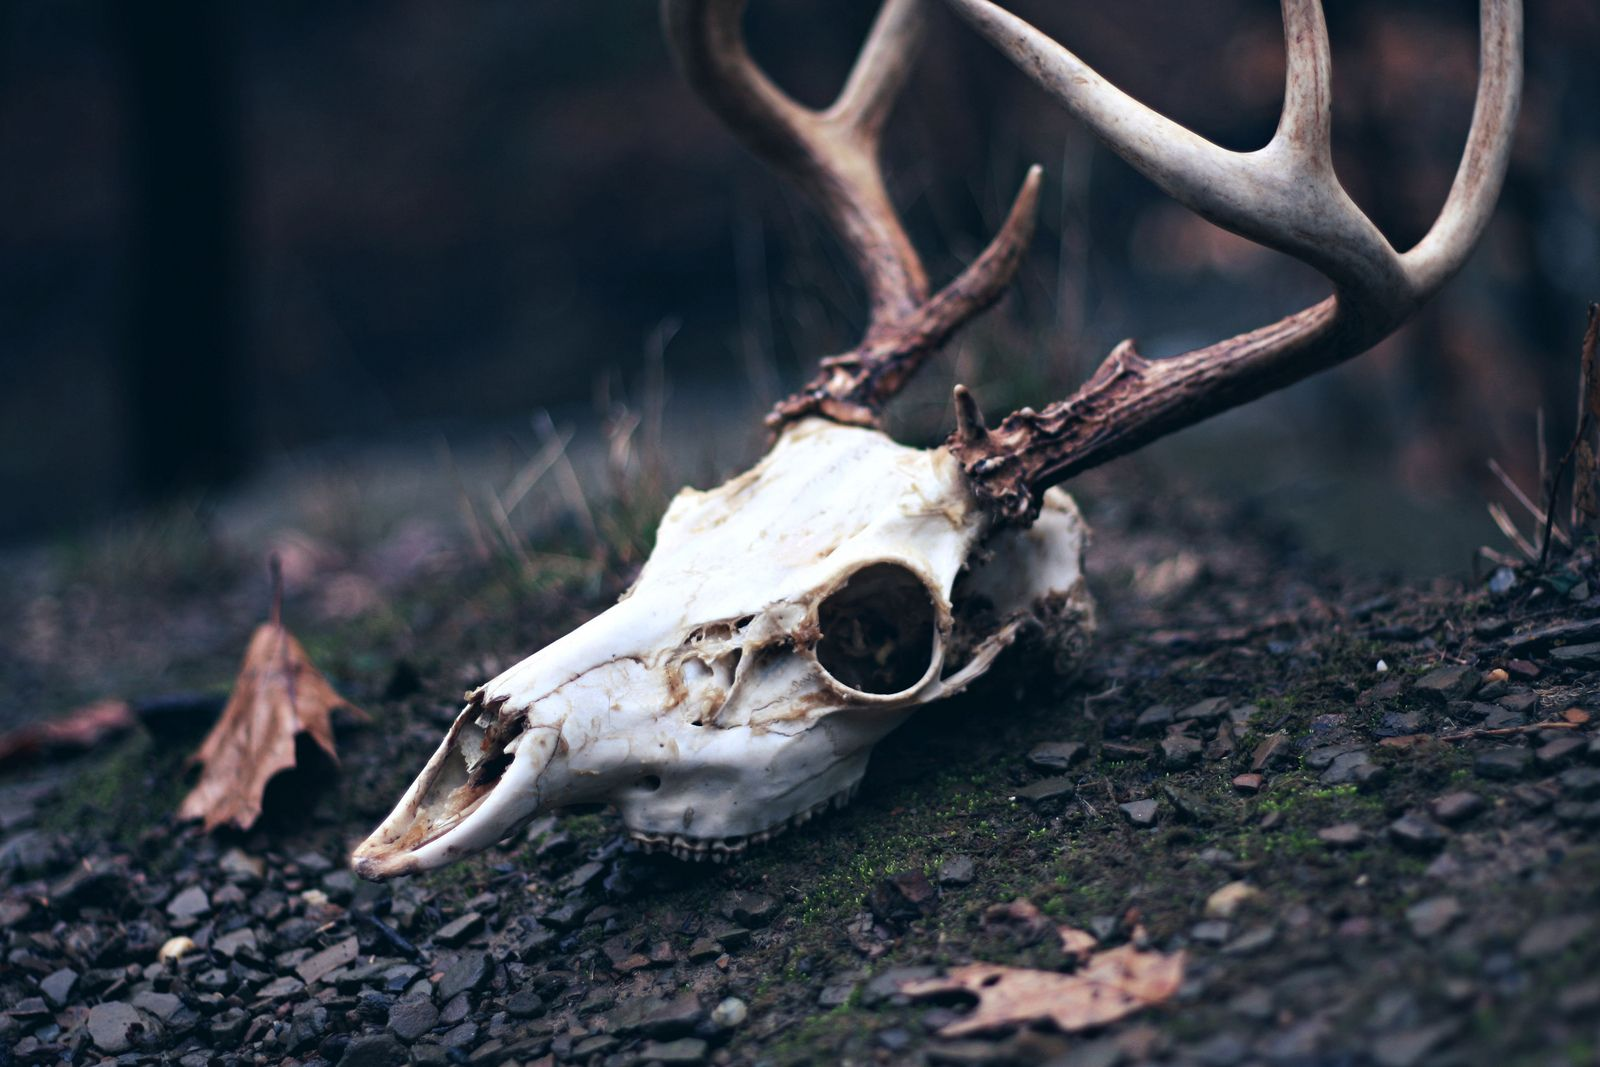 Deer Skull | Pinterest | Deer skulls, Dark photography and Photo s